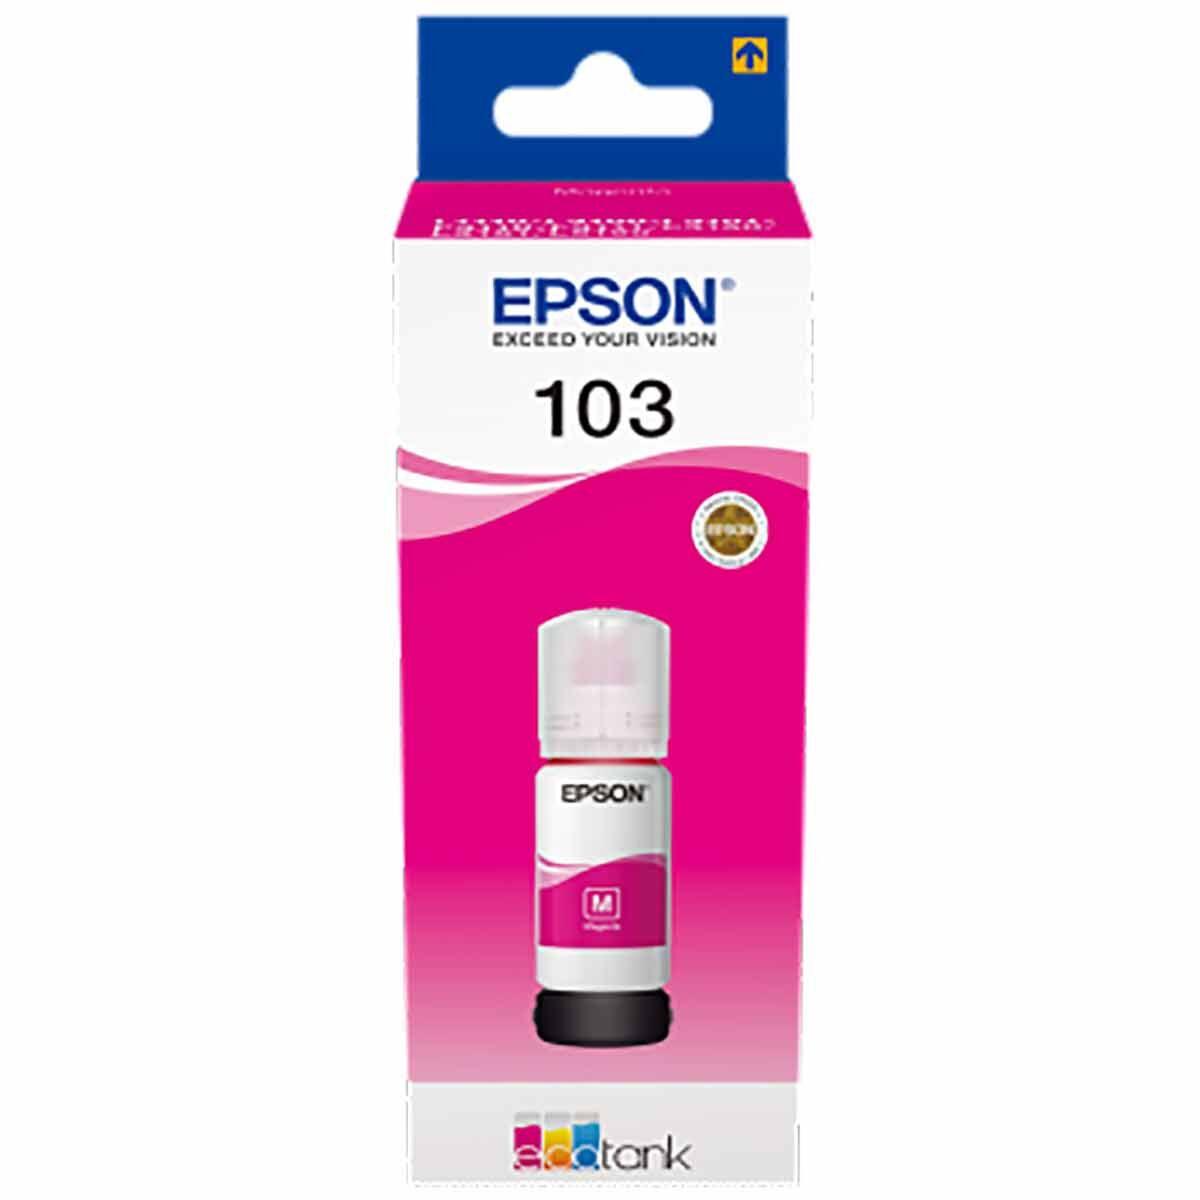 Epson 103 Colour Ink Bottle Magenta